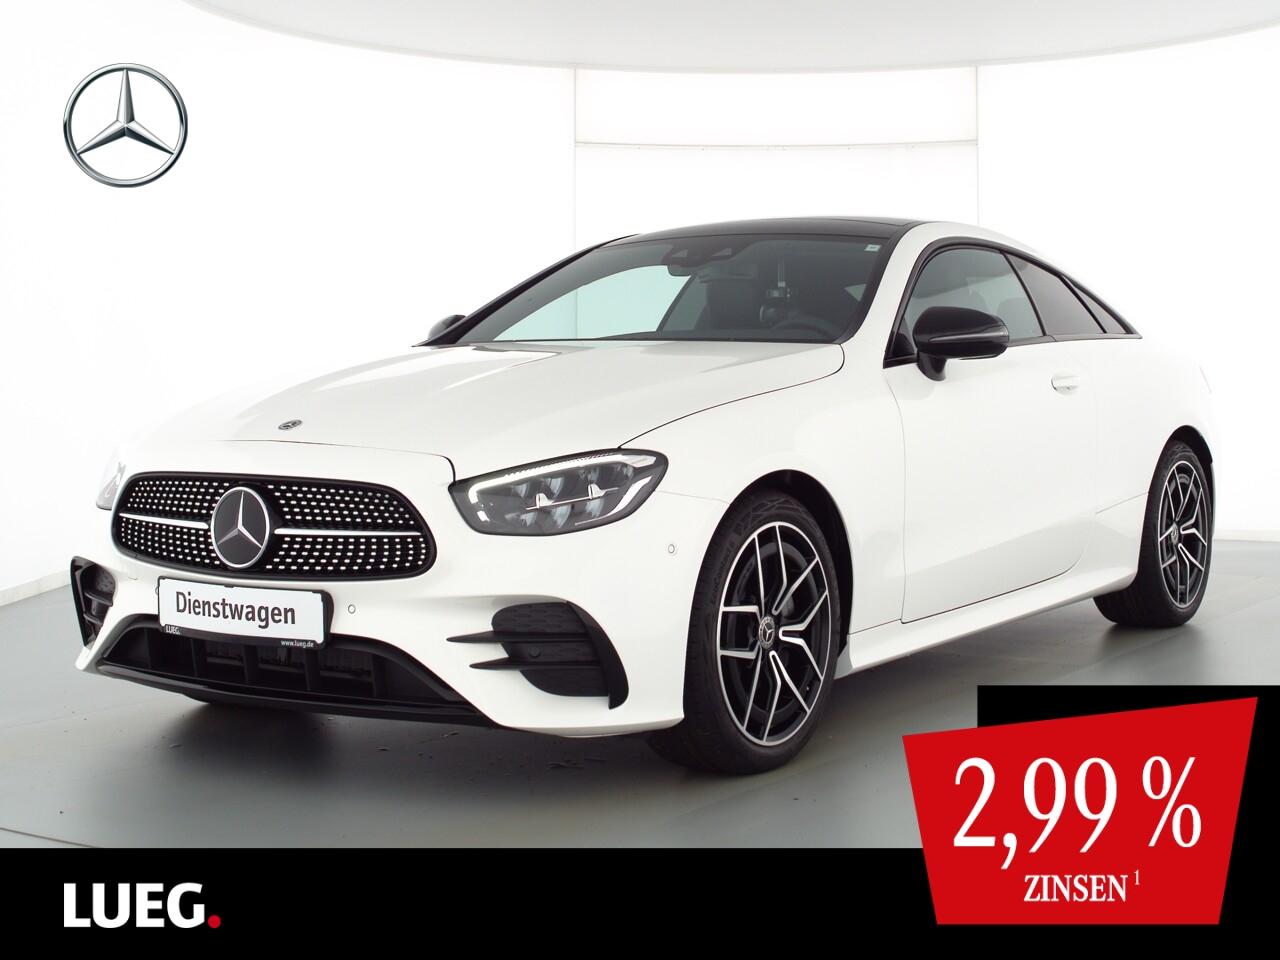 Mercedes-Benz E 220 d Coupé AMG+NIGHT+PANO+FAHRASS+MEMORY+KAM., Jahr 2021, Diesel